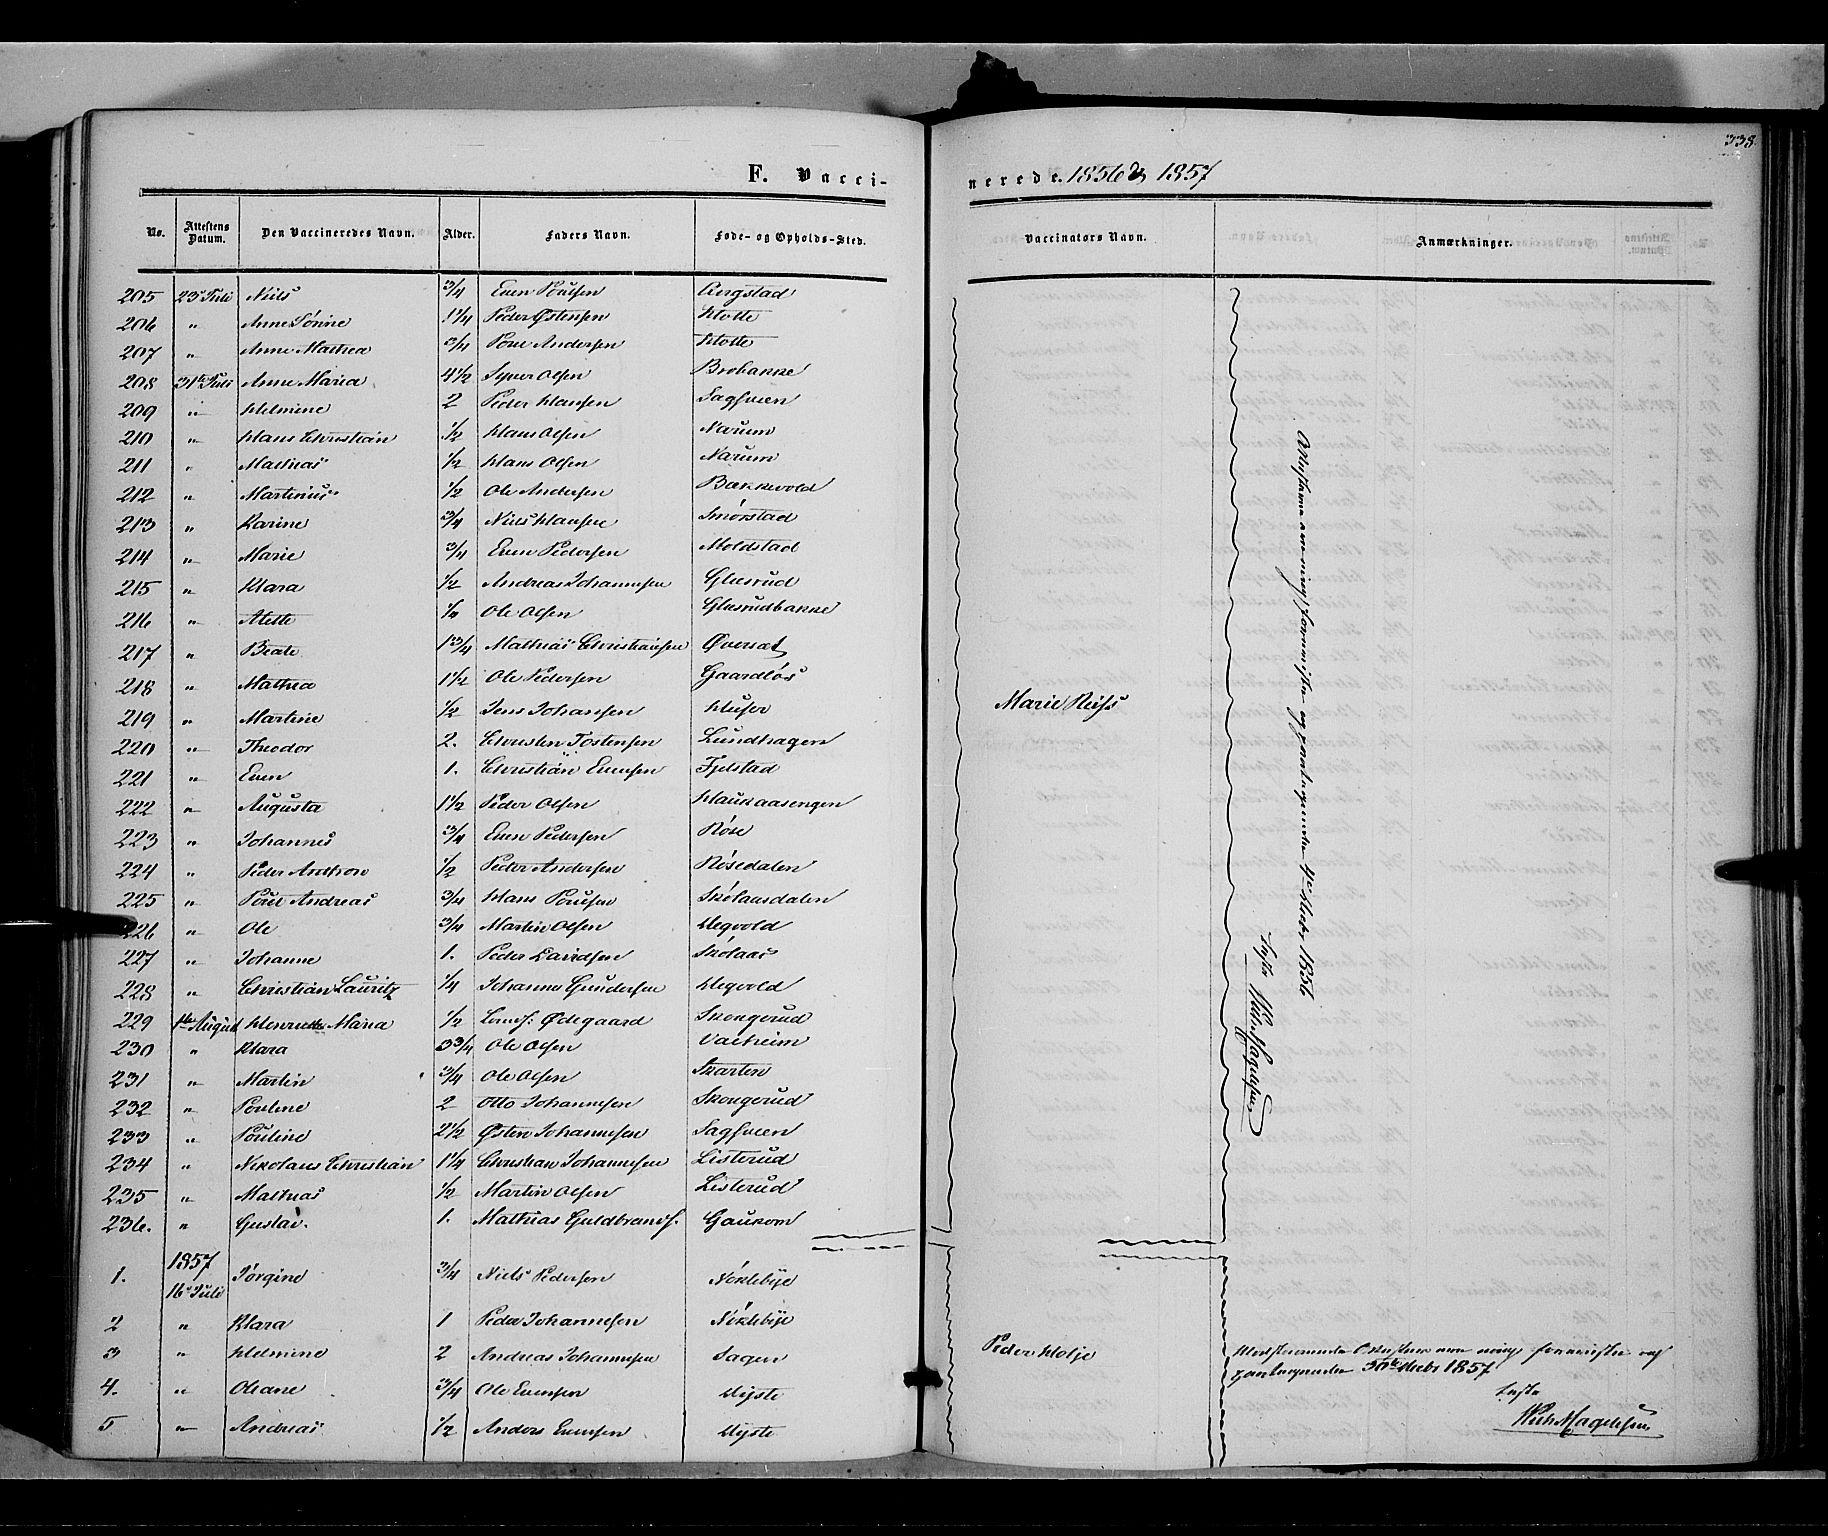 SAH, Vestre Toten prestekontor, H/Ha/Haa/L0006: Ministerialbok nr. 6, 1856-1861, s. 338